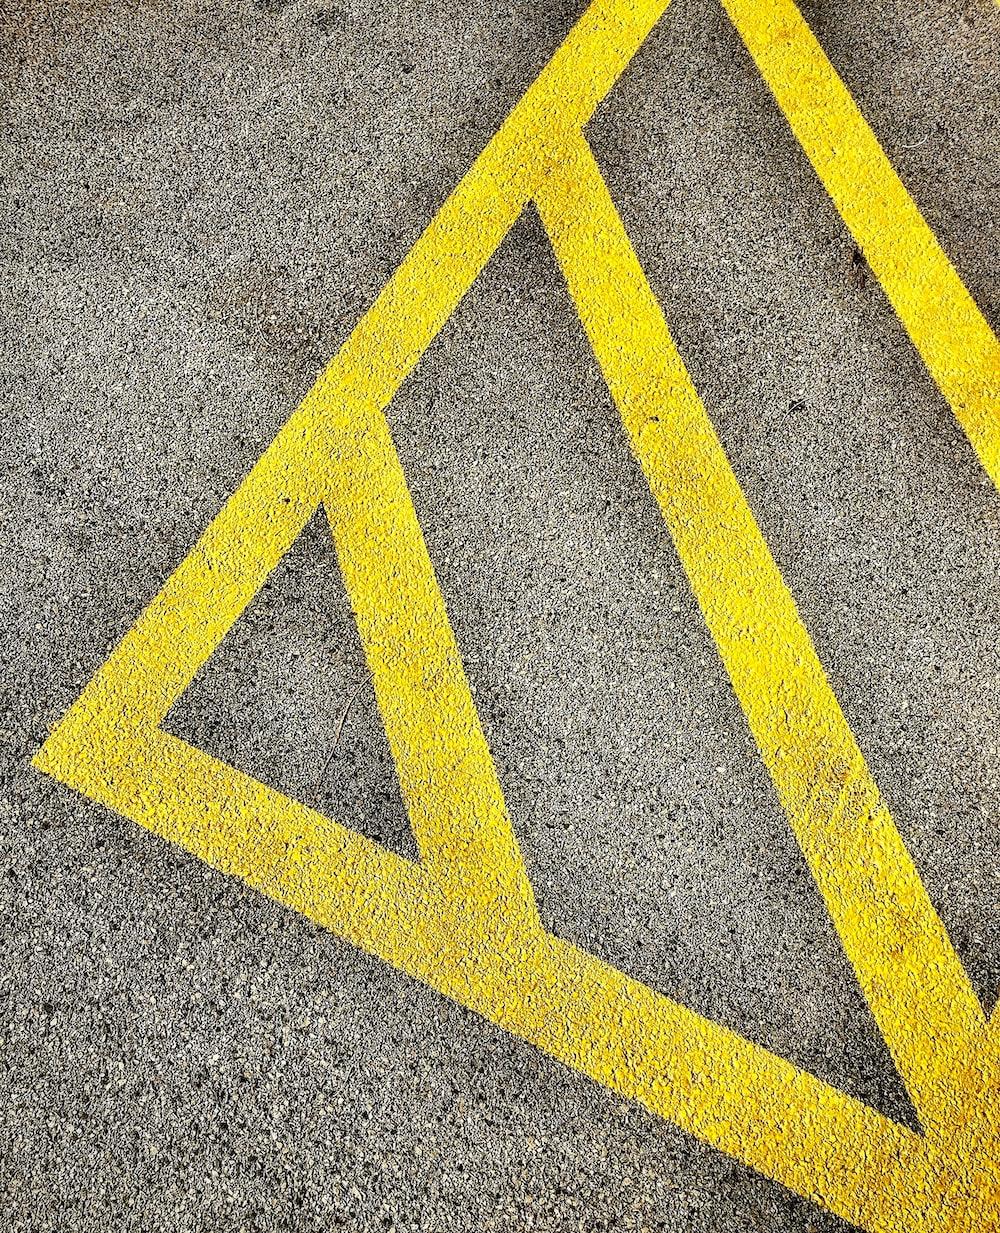 gray and yellow concrete pavement close-up photo